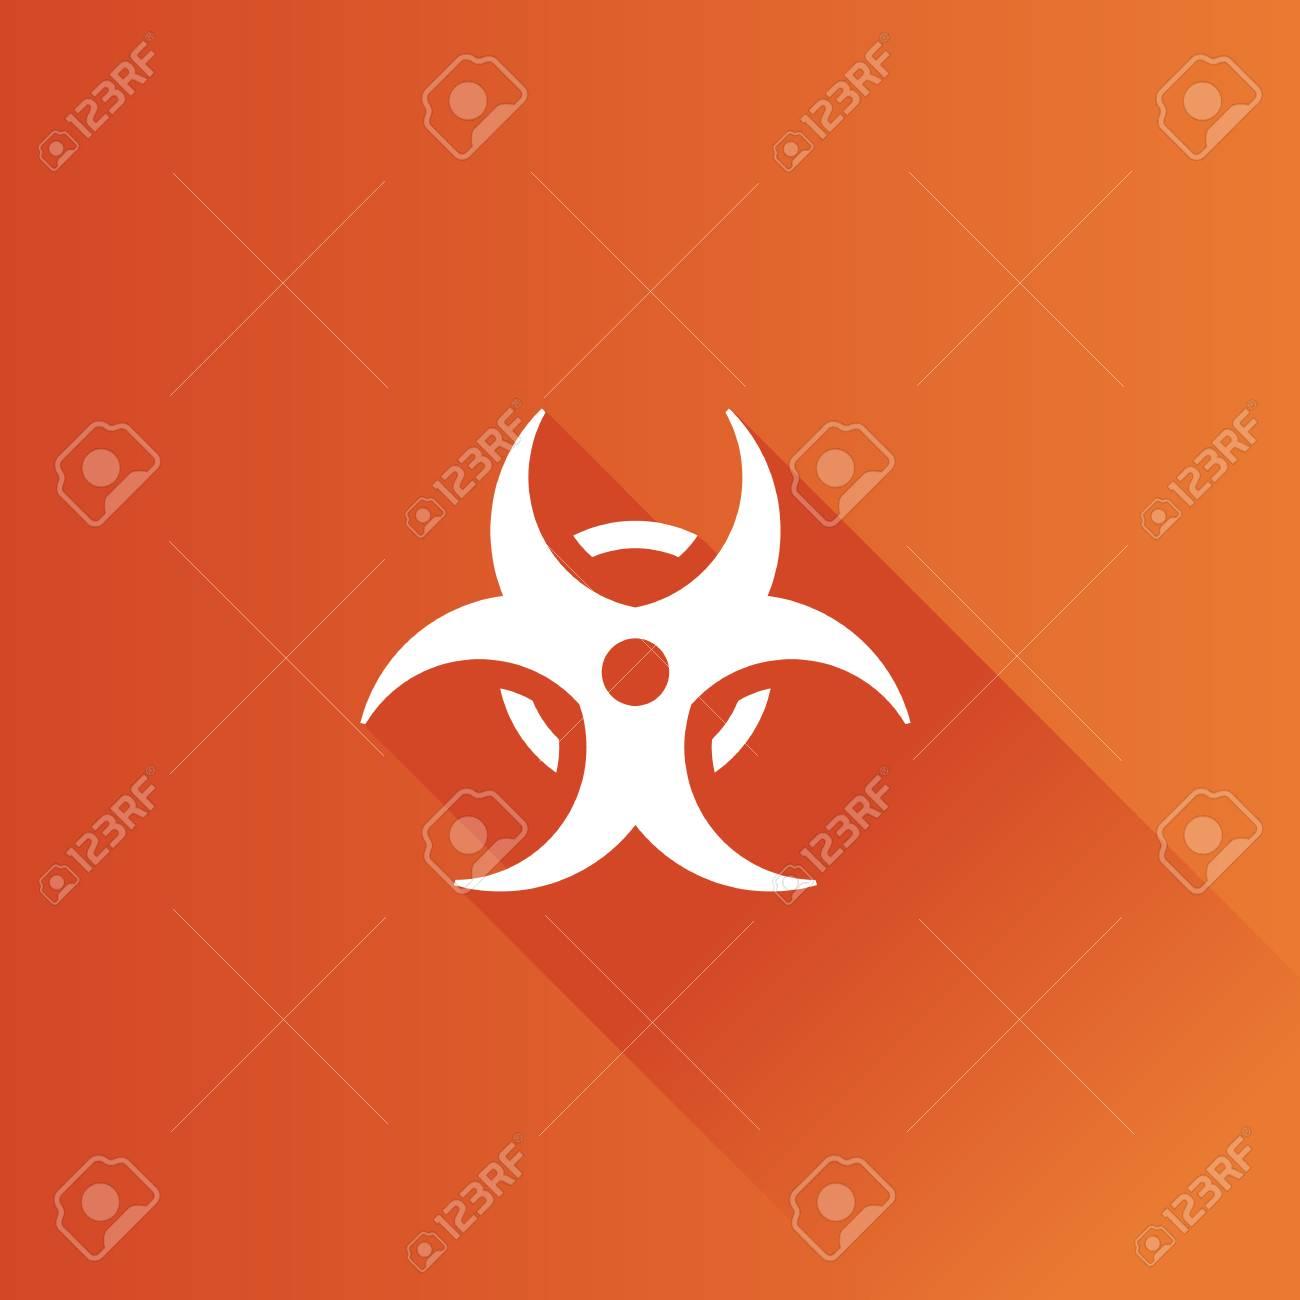 Biohazard symbol icon in metro user interface color style science biohazard symbol icon in metro user interface color style science technology hazard stock vector biocorpaavc Images